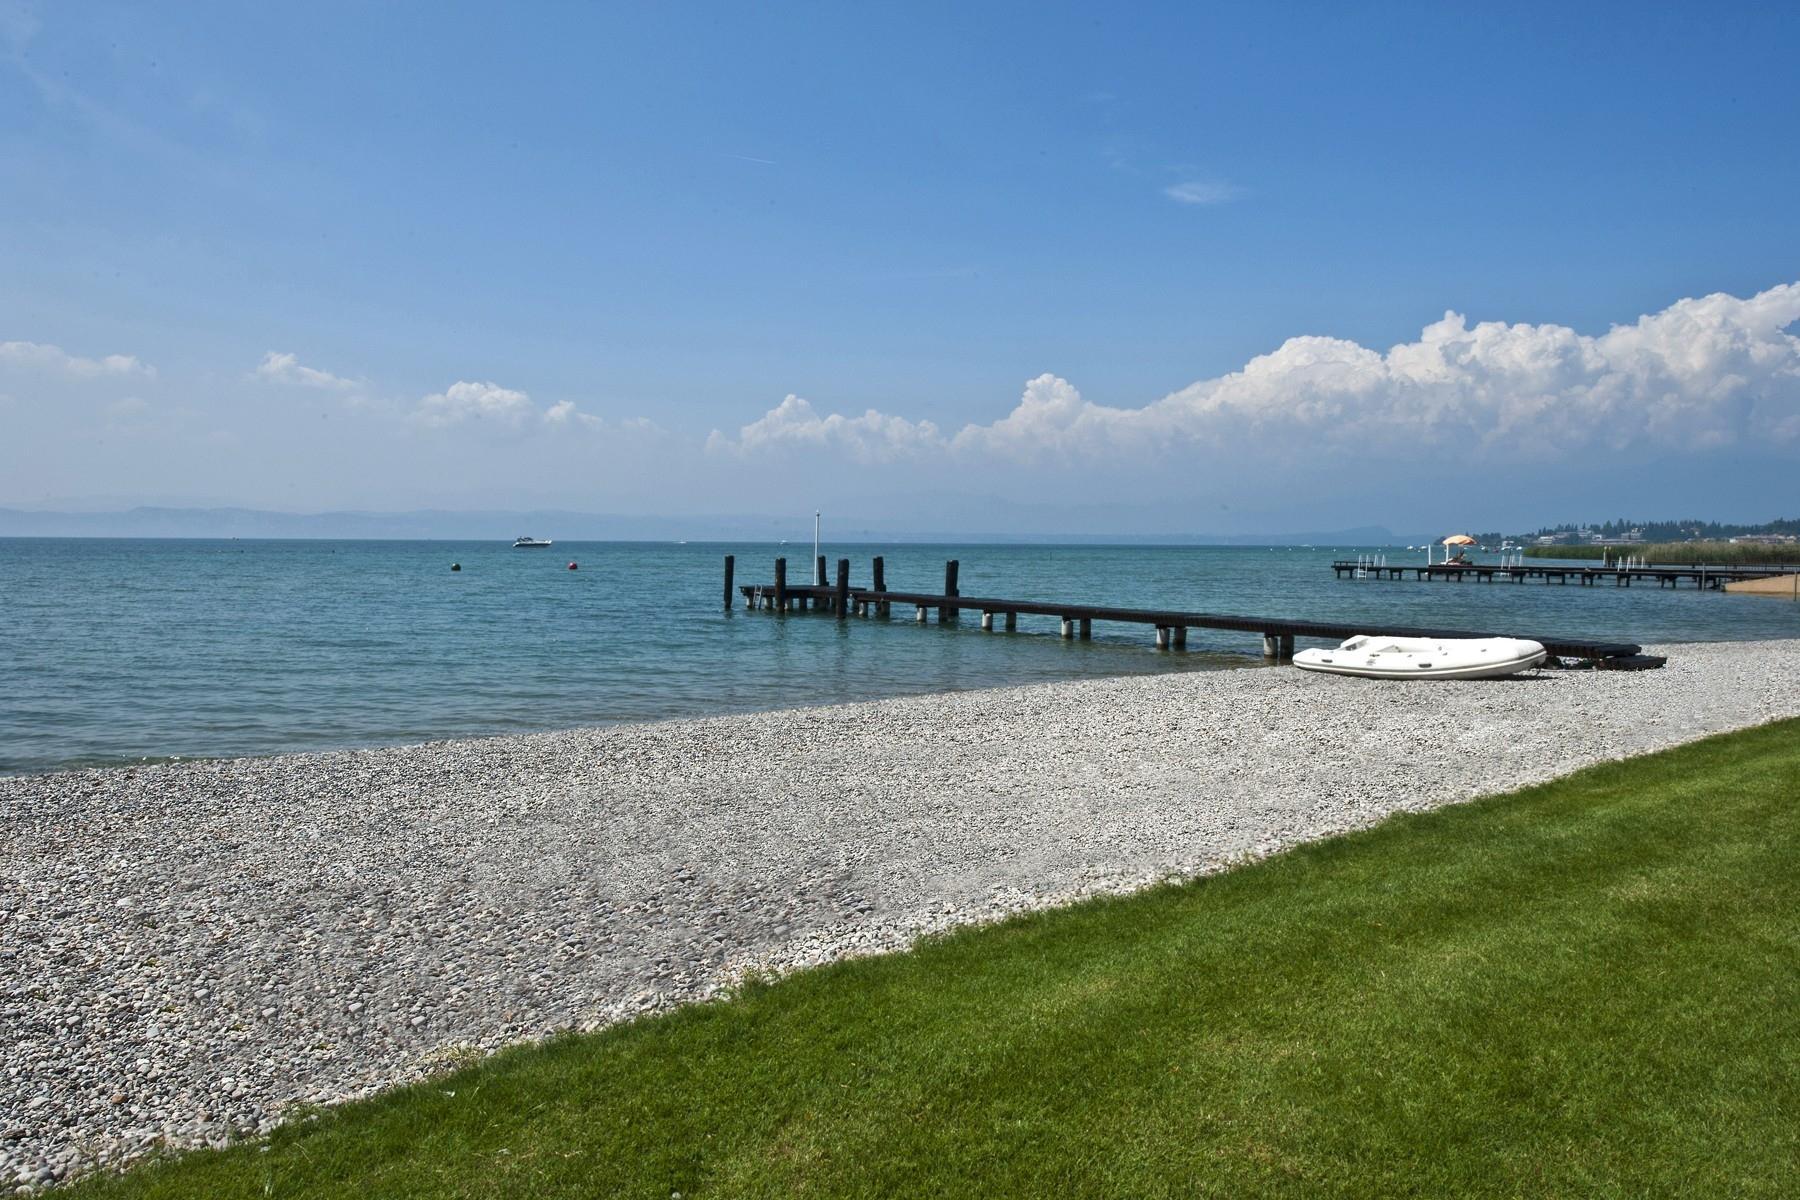 Villa unica pied dans l'eau con spiaggia e pontile a Sirmione - 3